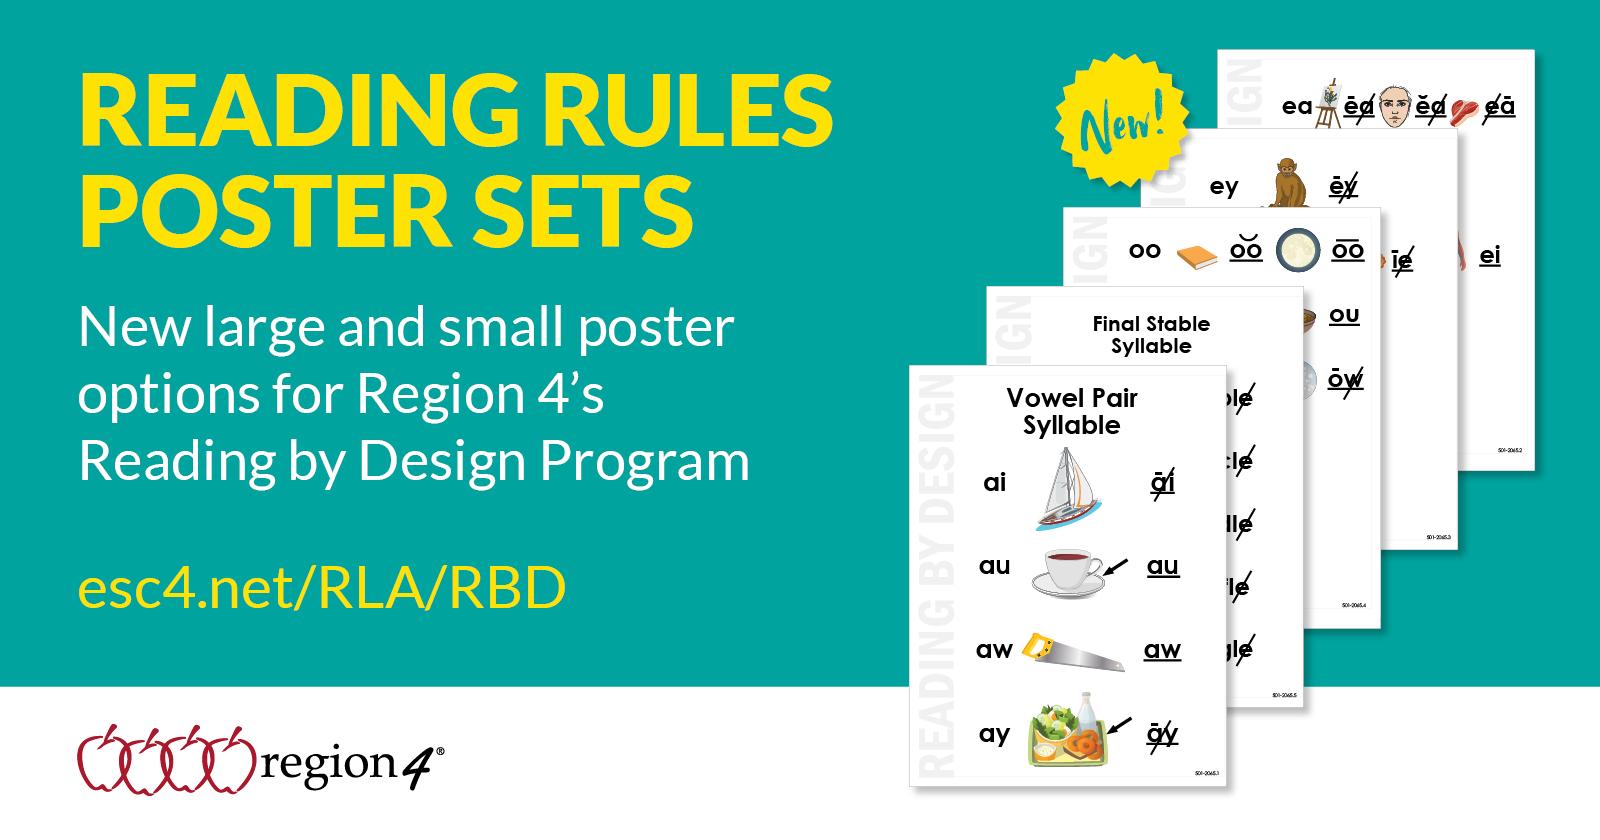 rla-rbd-small-poster-set-1200x630